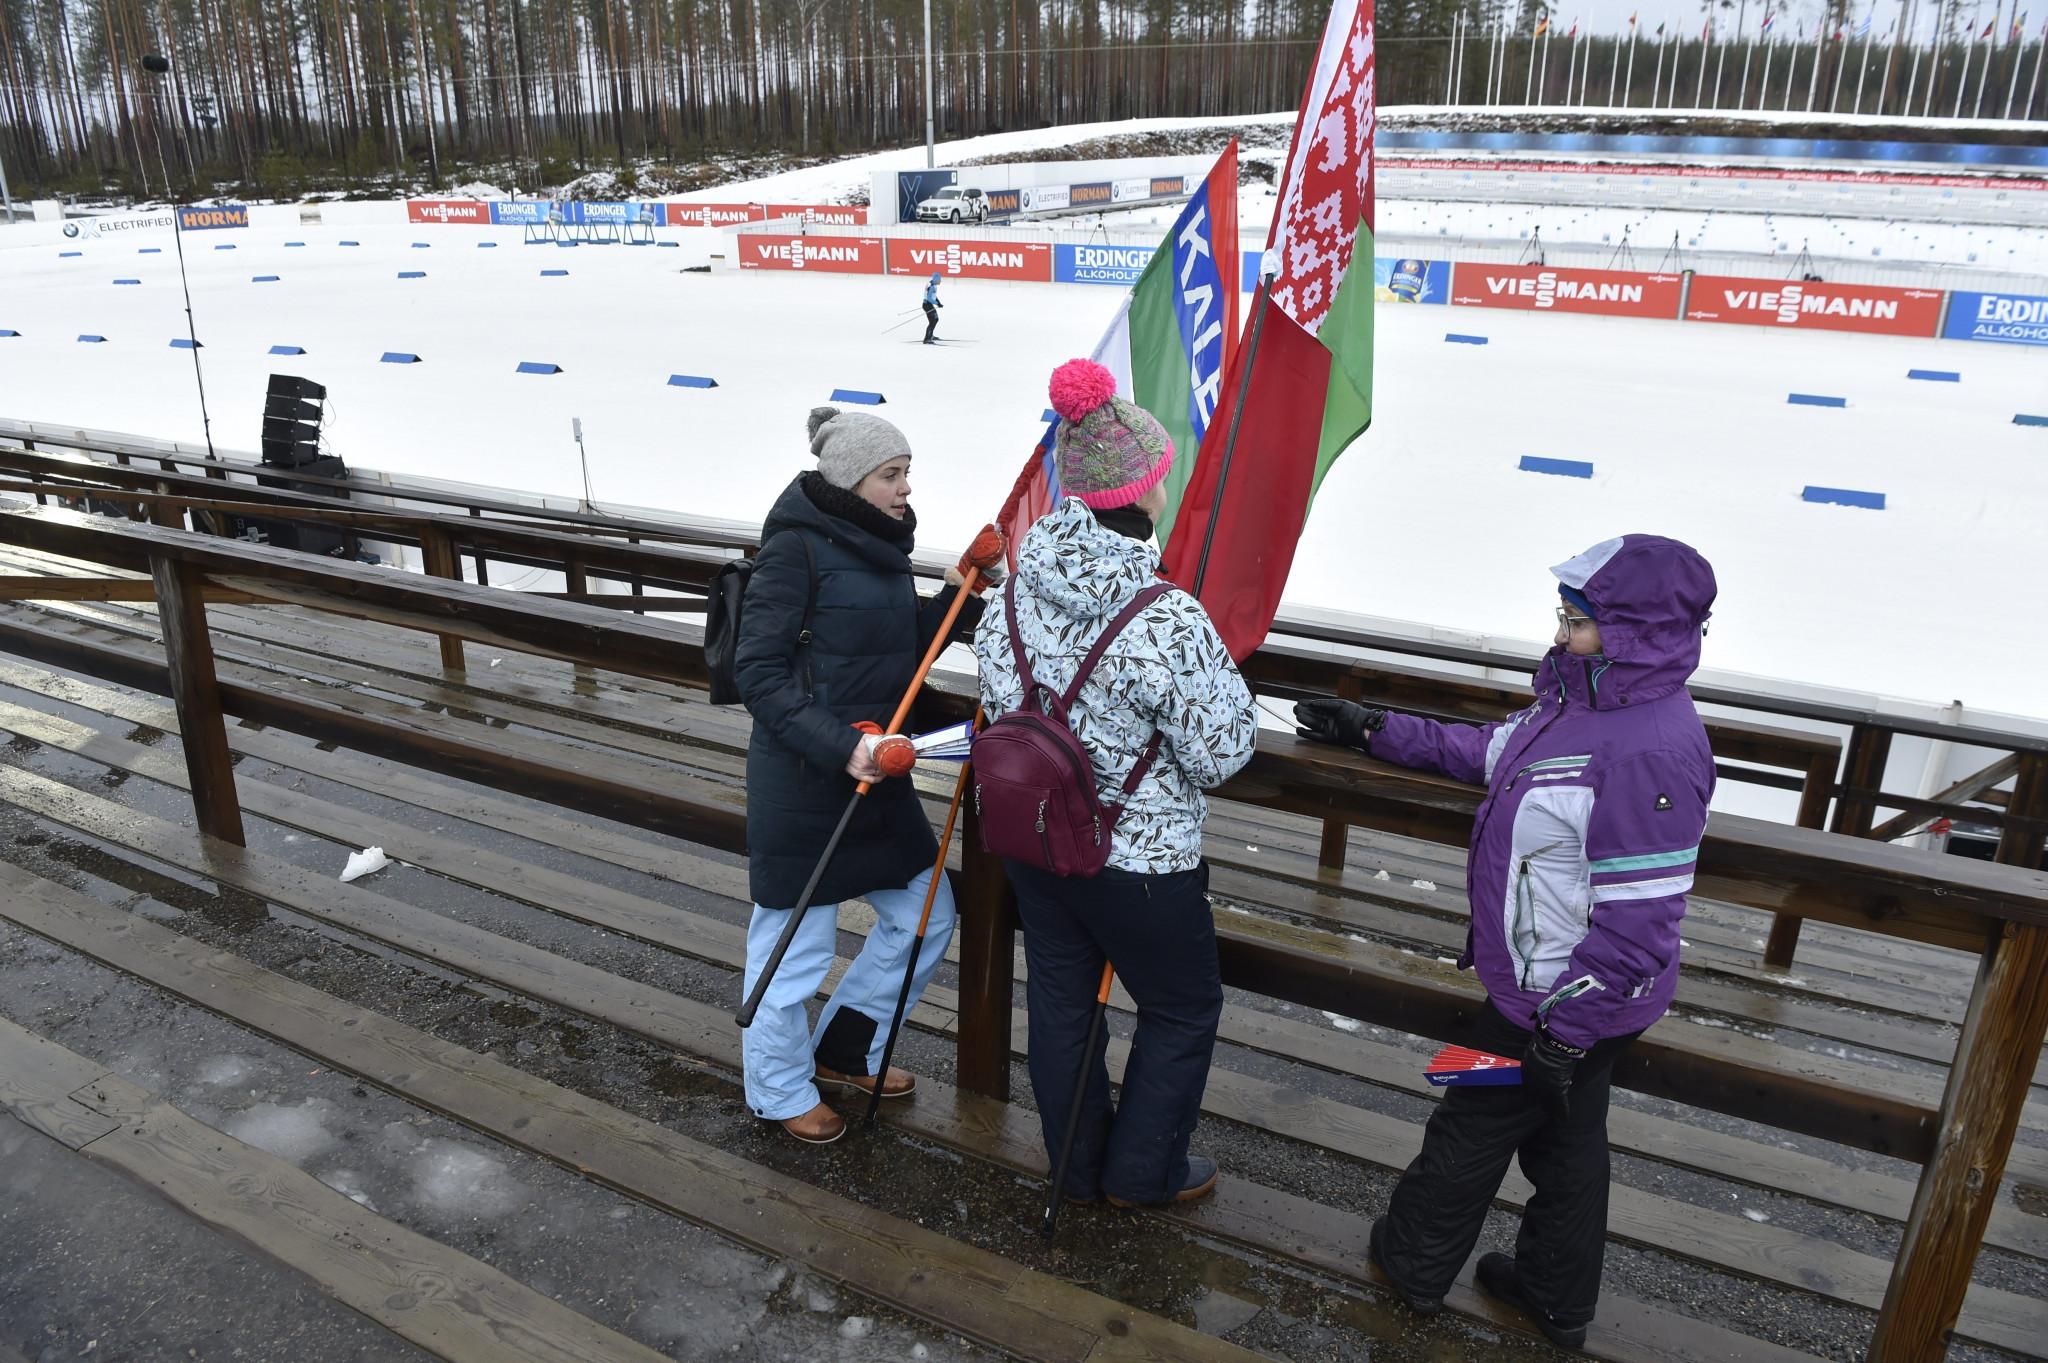 Members of Russian, Romanian and Moldovan teams quarantined ahead of IBU World Cup opener